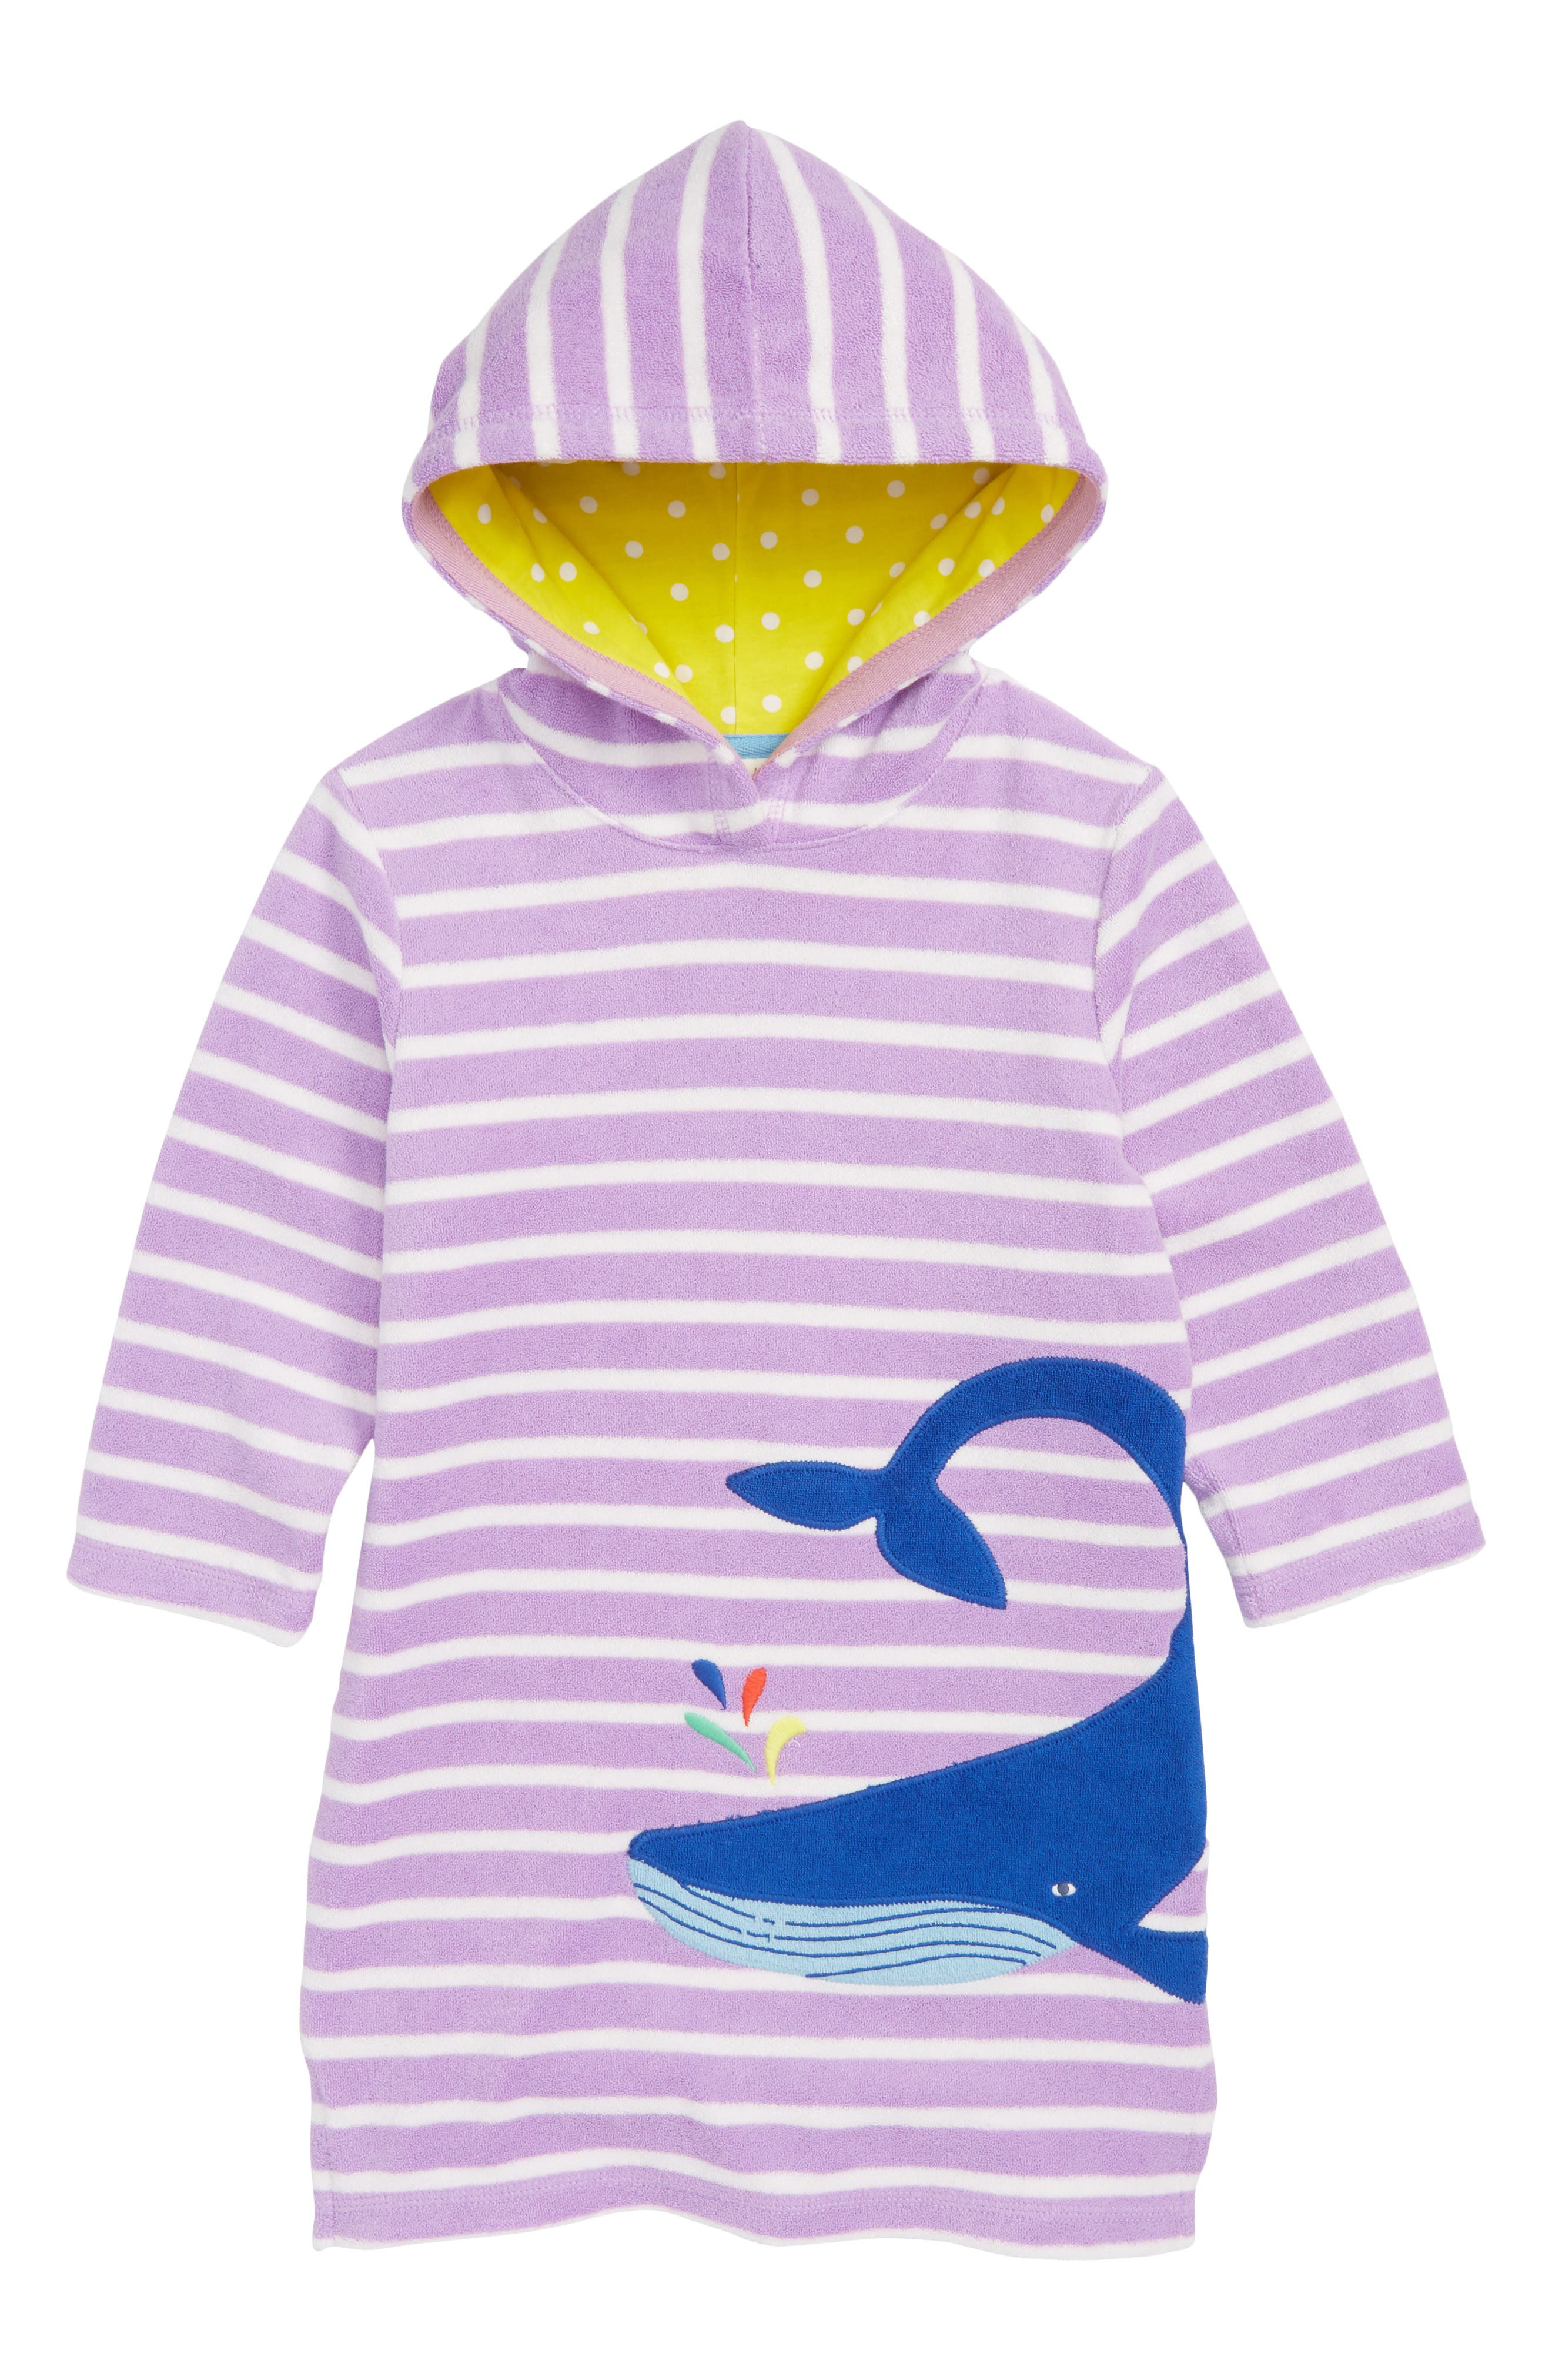 Appliqué Hooded Toweling Beach Dress,                         Main,                         color, Lavender/ Ivory